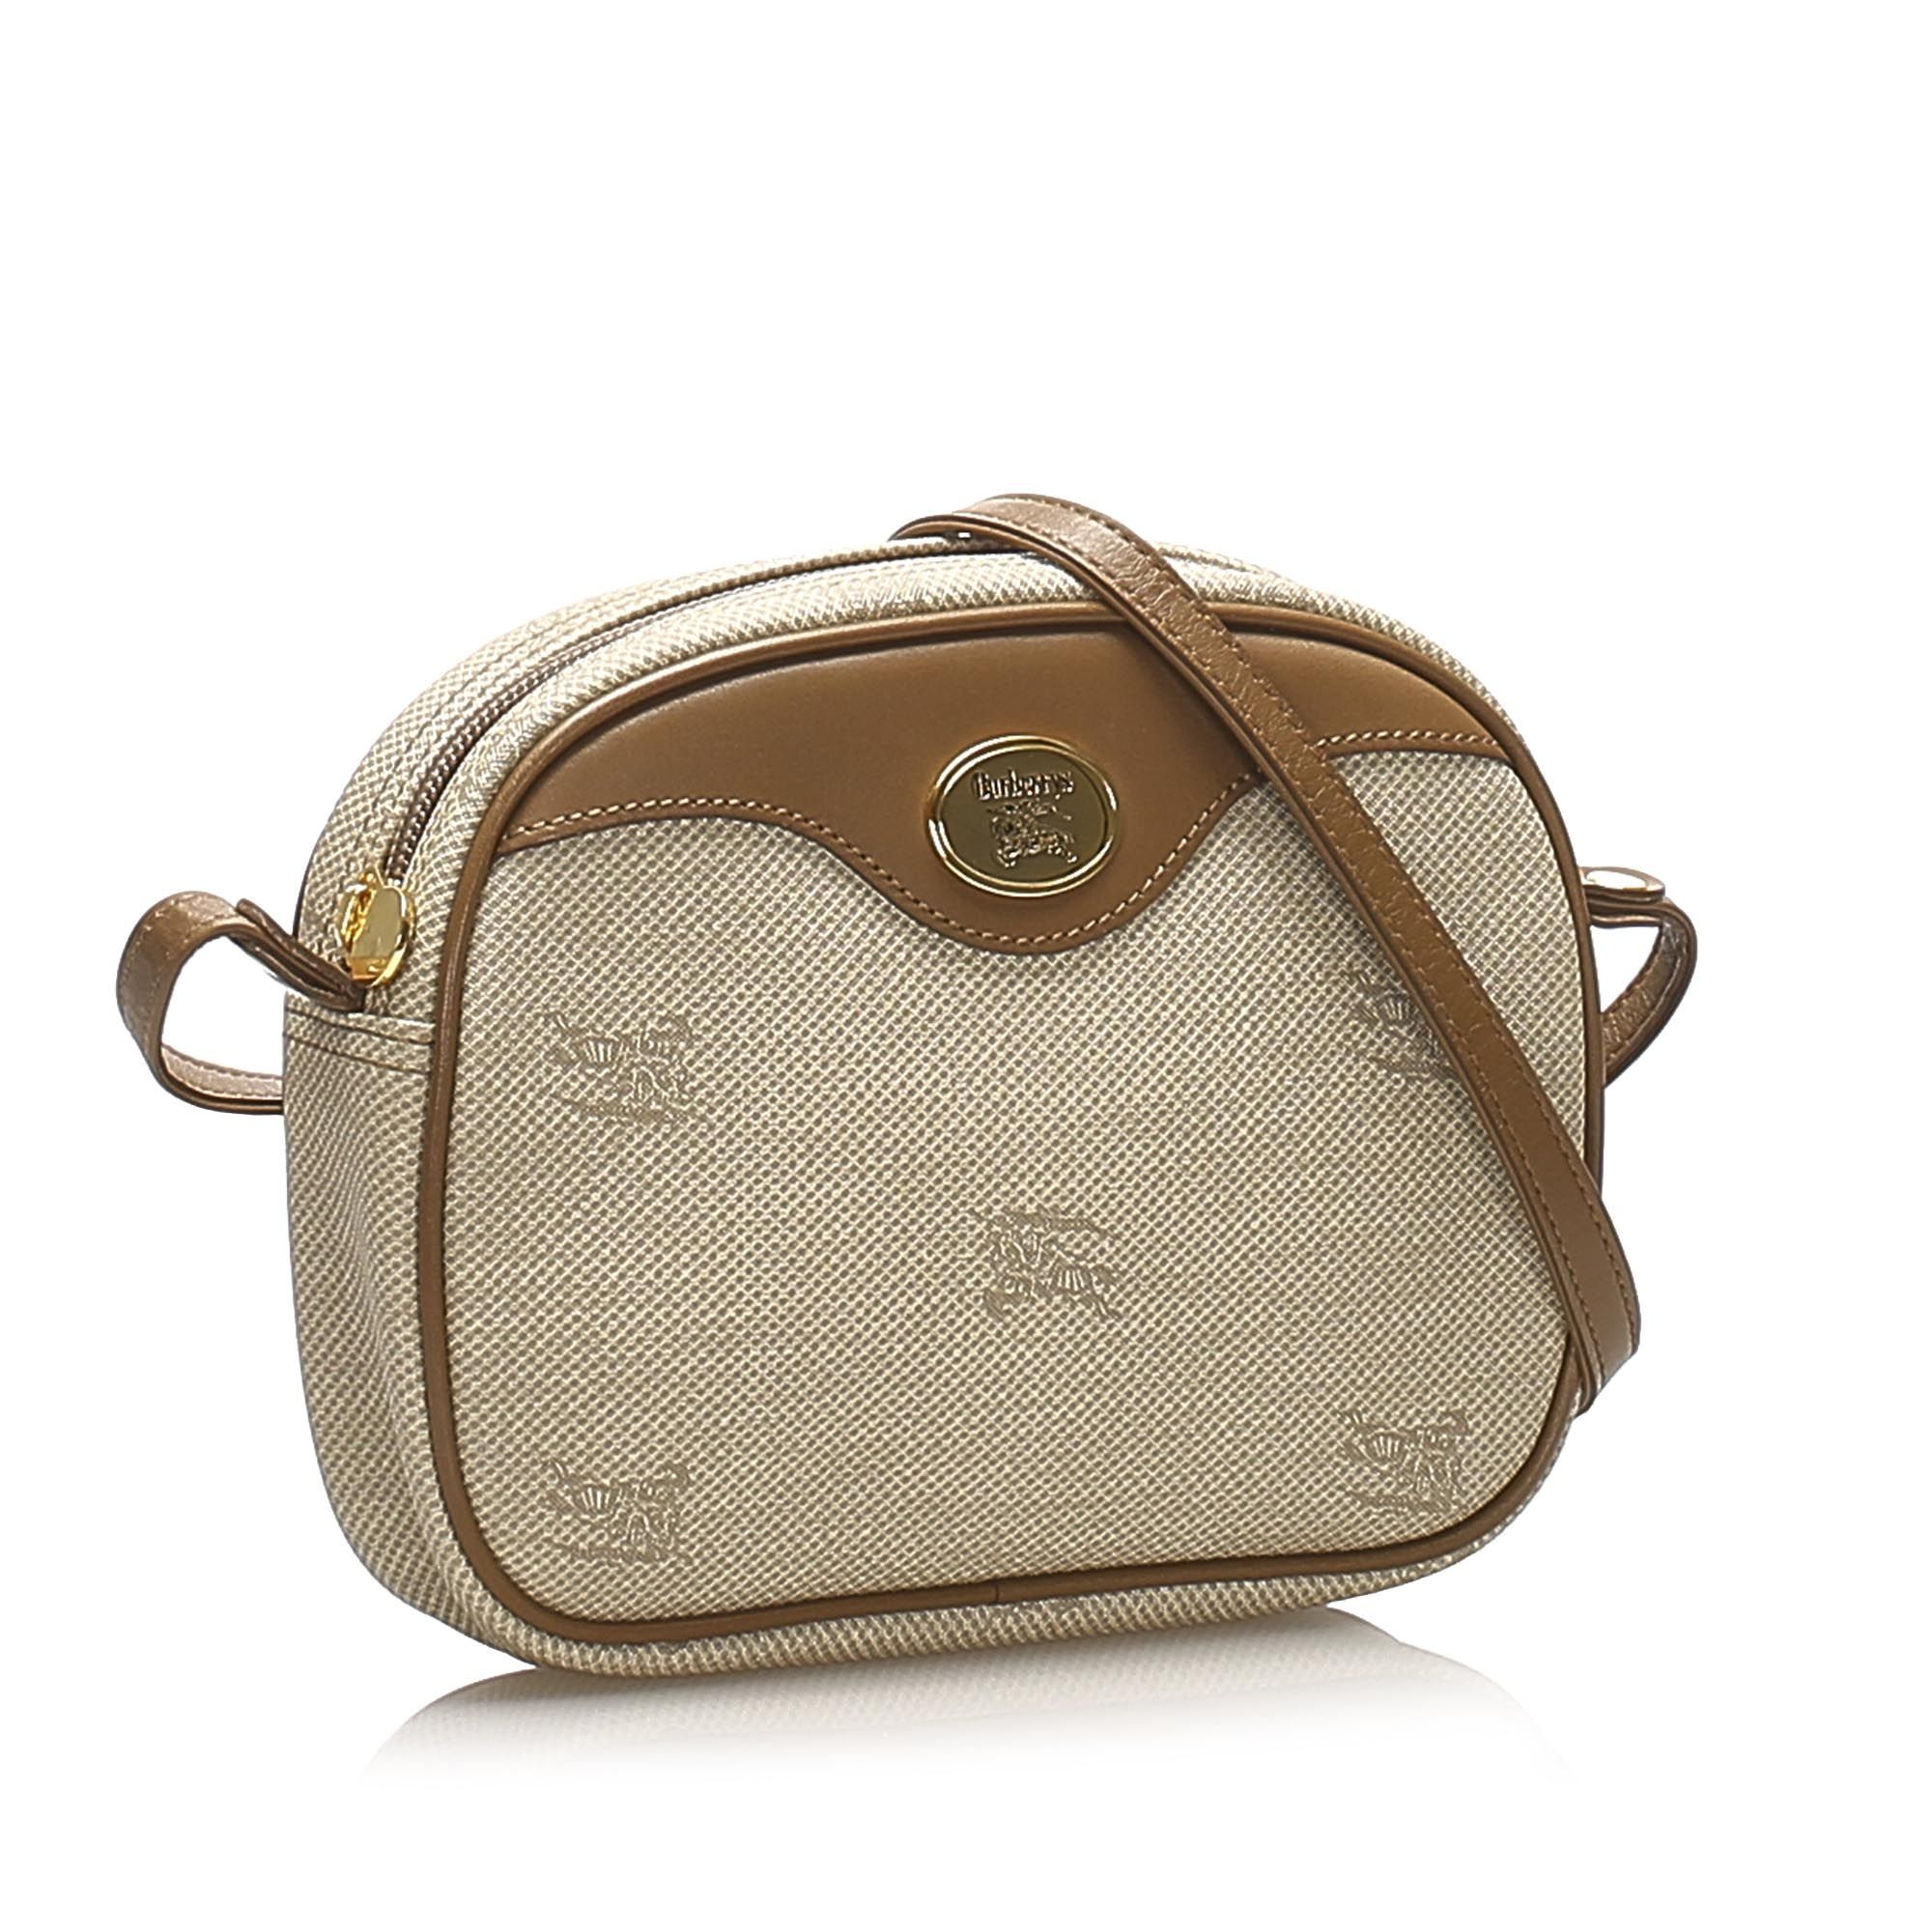 Vintage Burberry Canvas Crossbody Bag Brown